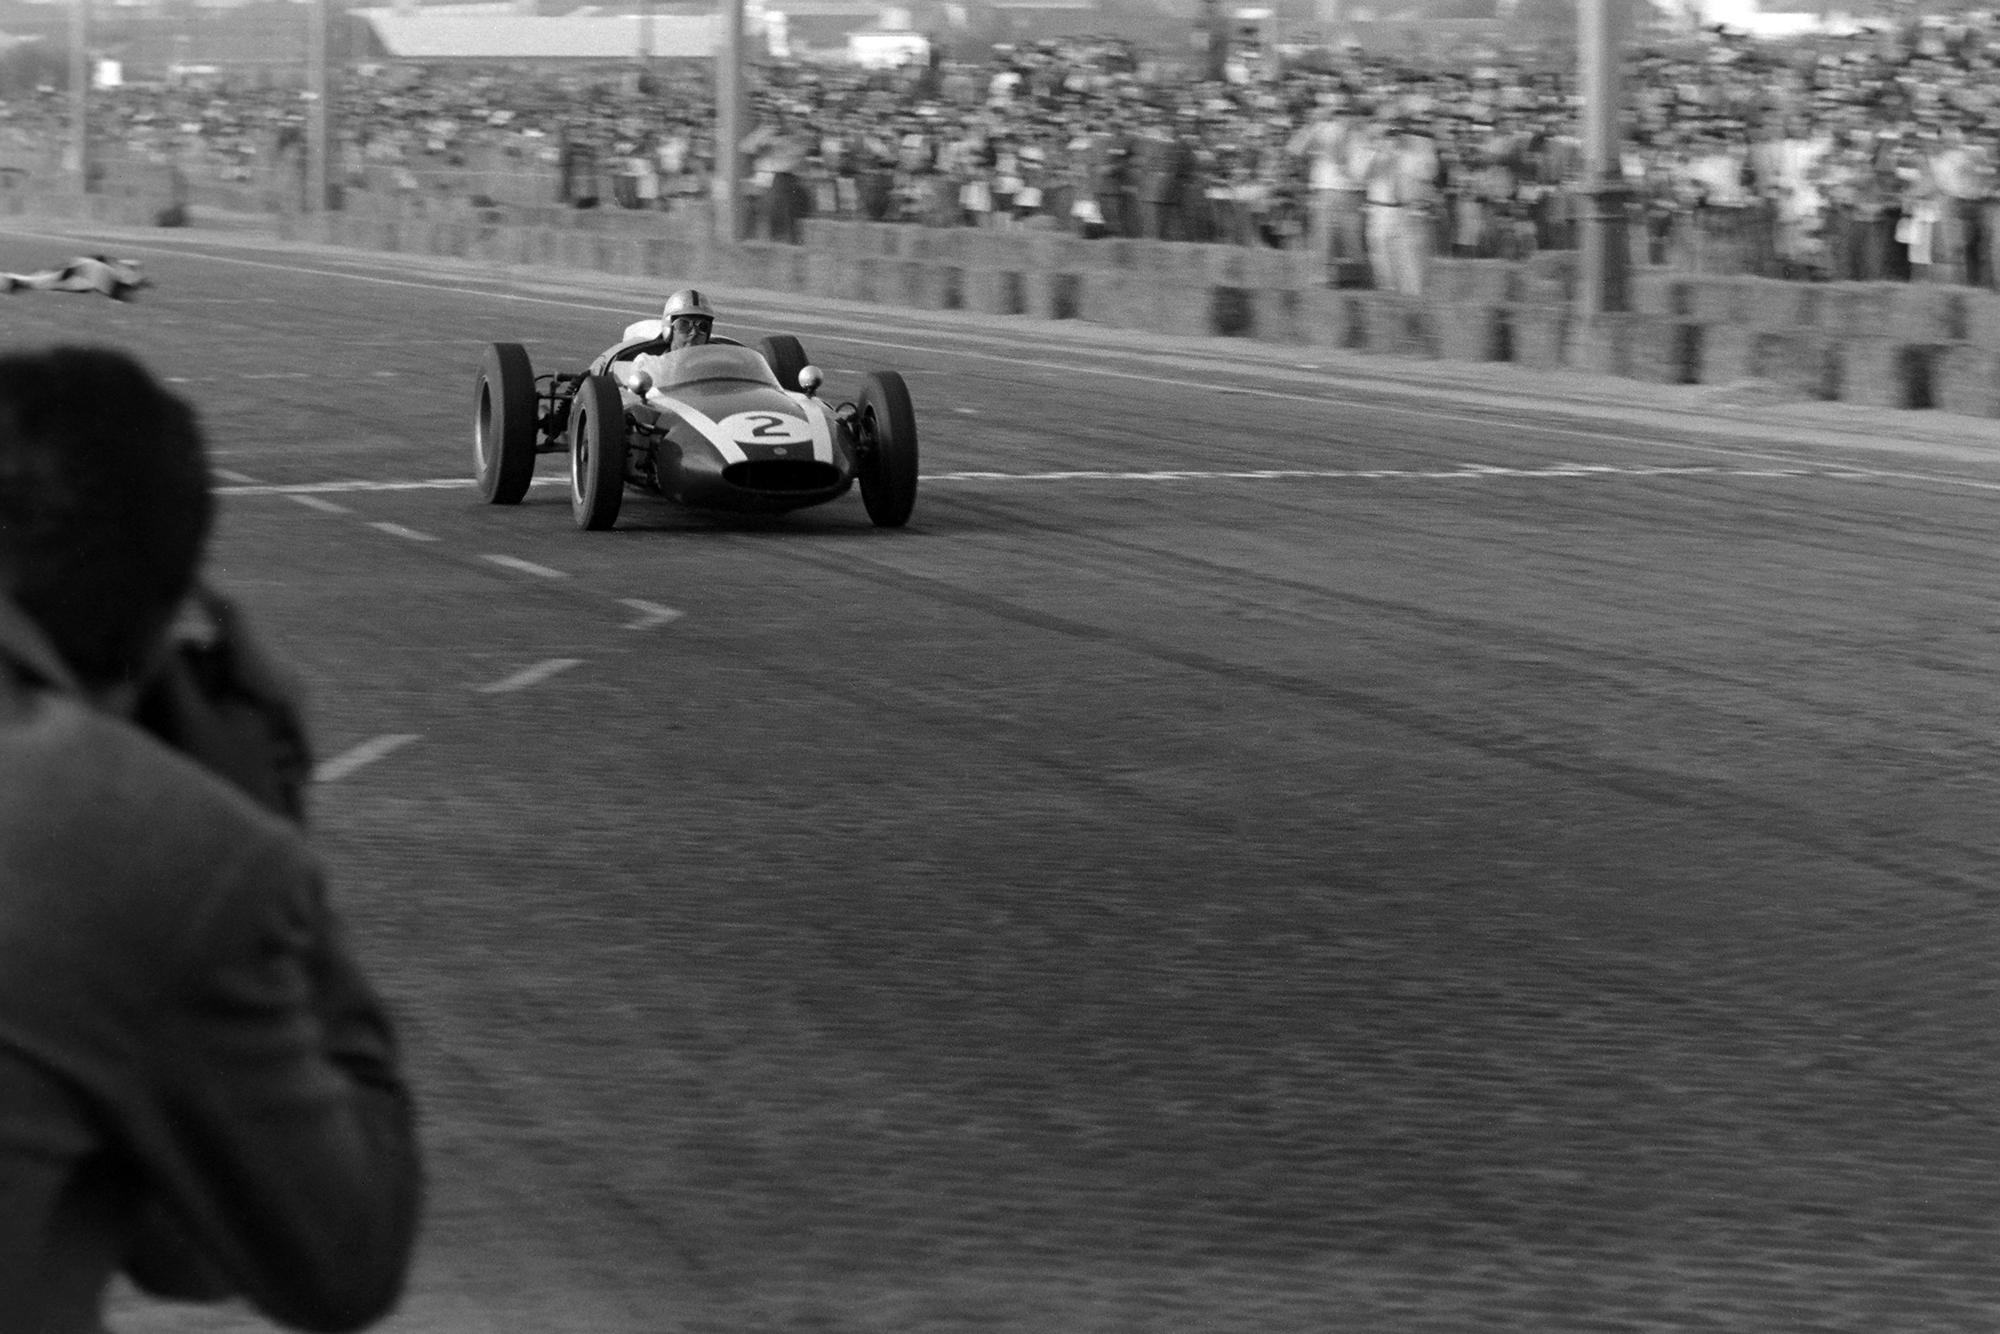 Brabham takes his 3rd consecutive win